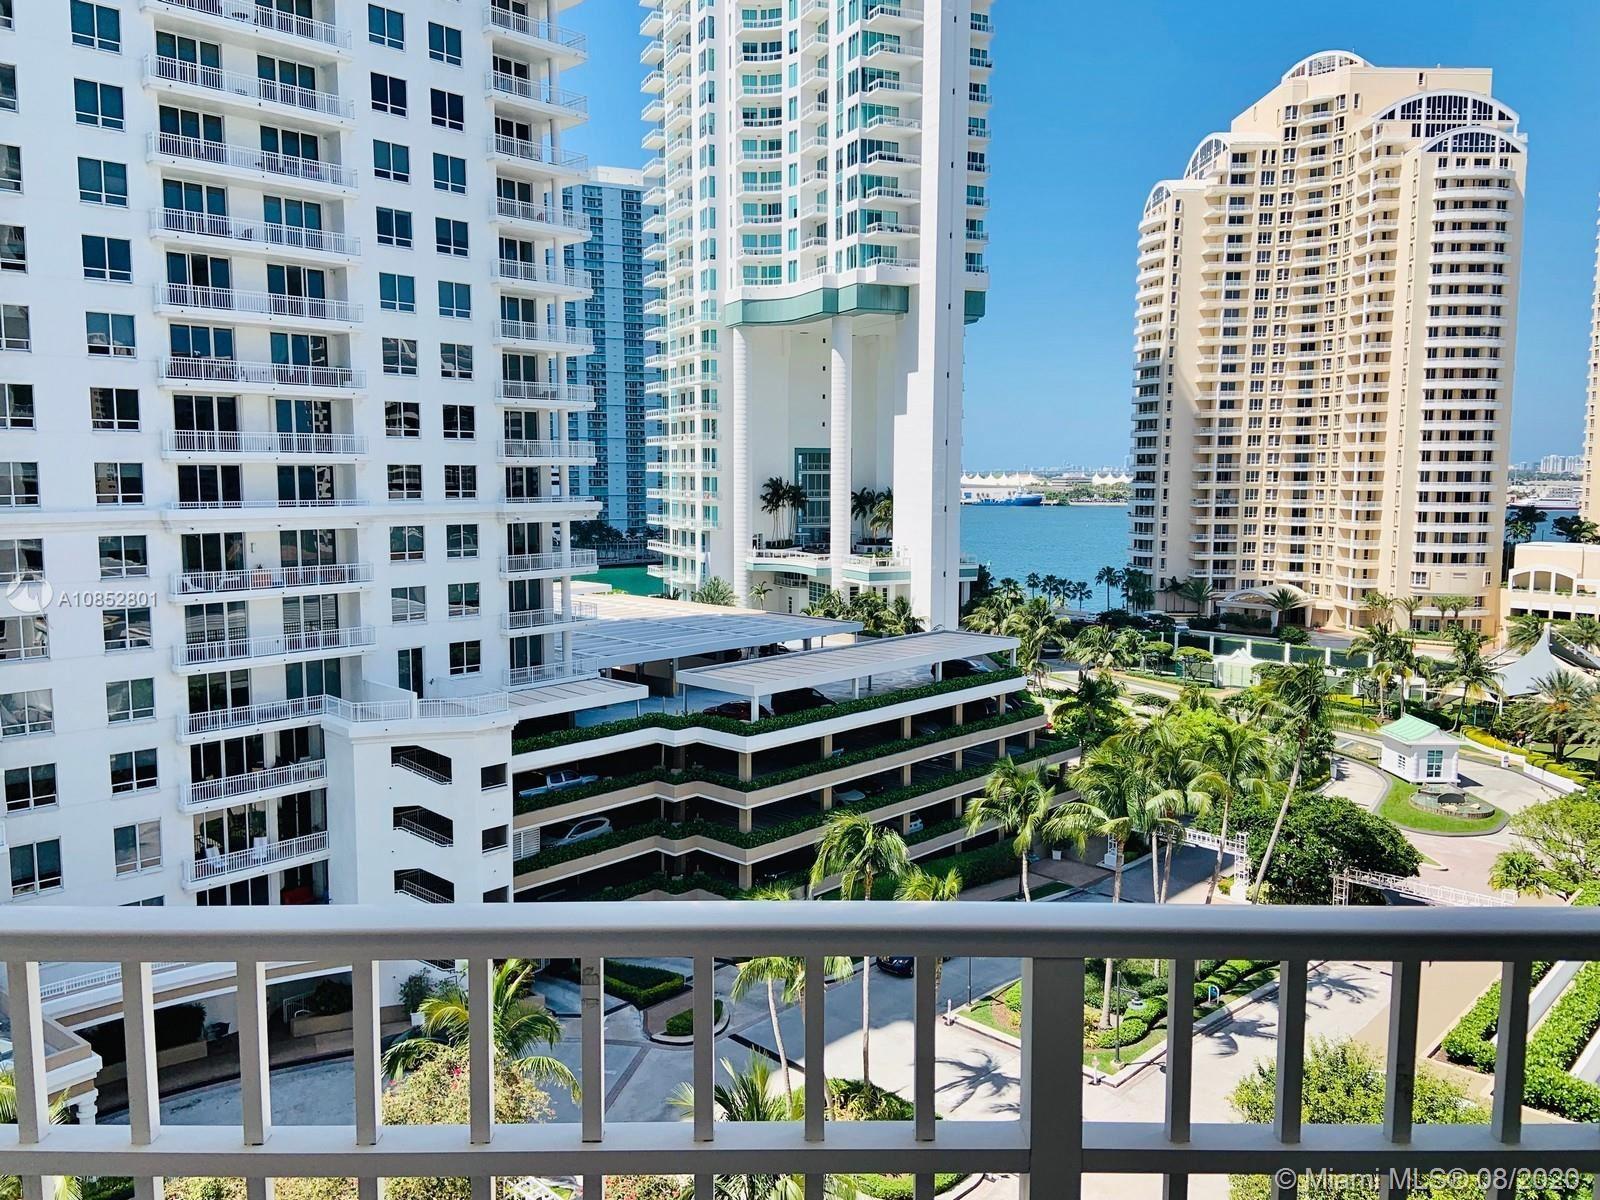 701 Brickell Key Blvd #1106, Miami, FL 33131 - #: A10852801